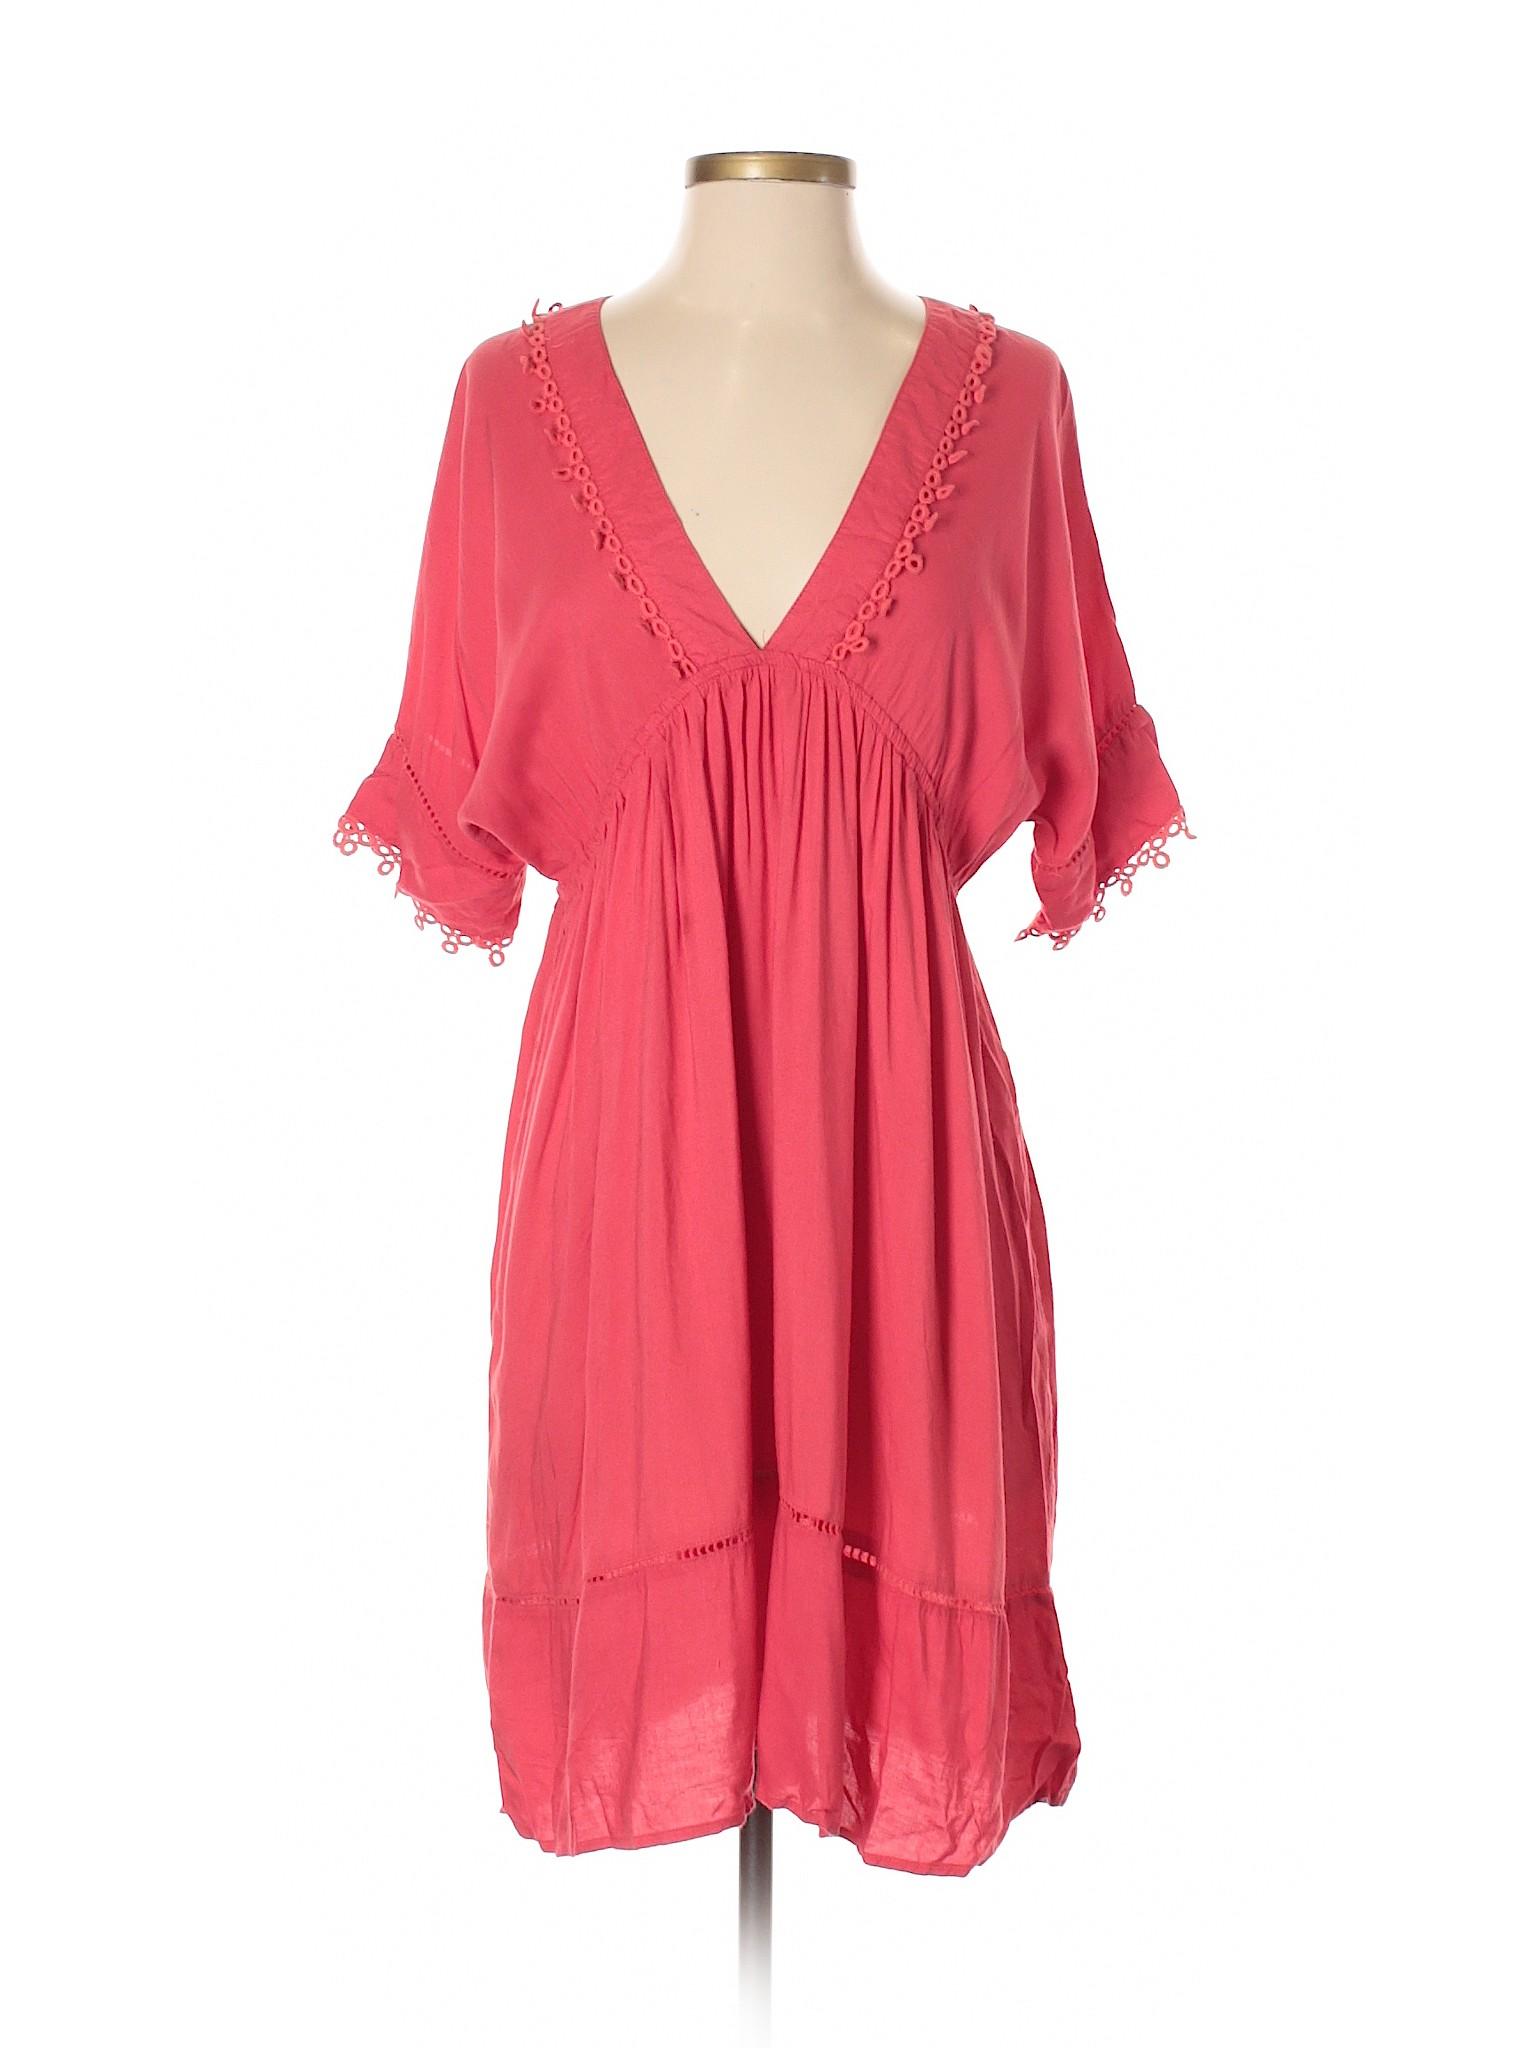 Selling Selling Akualani Casual Akualani Selling Dress Dress Selling Casual Akualani Dress Casual 8S8xrqp